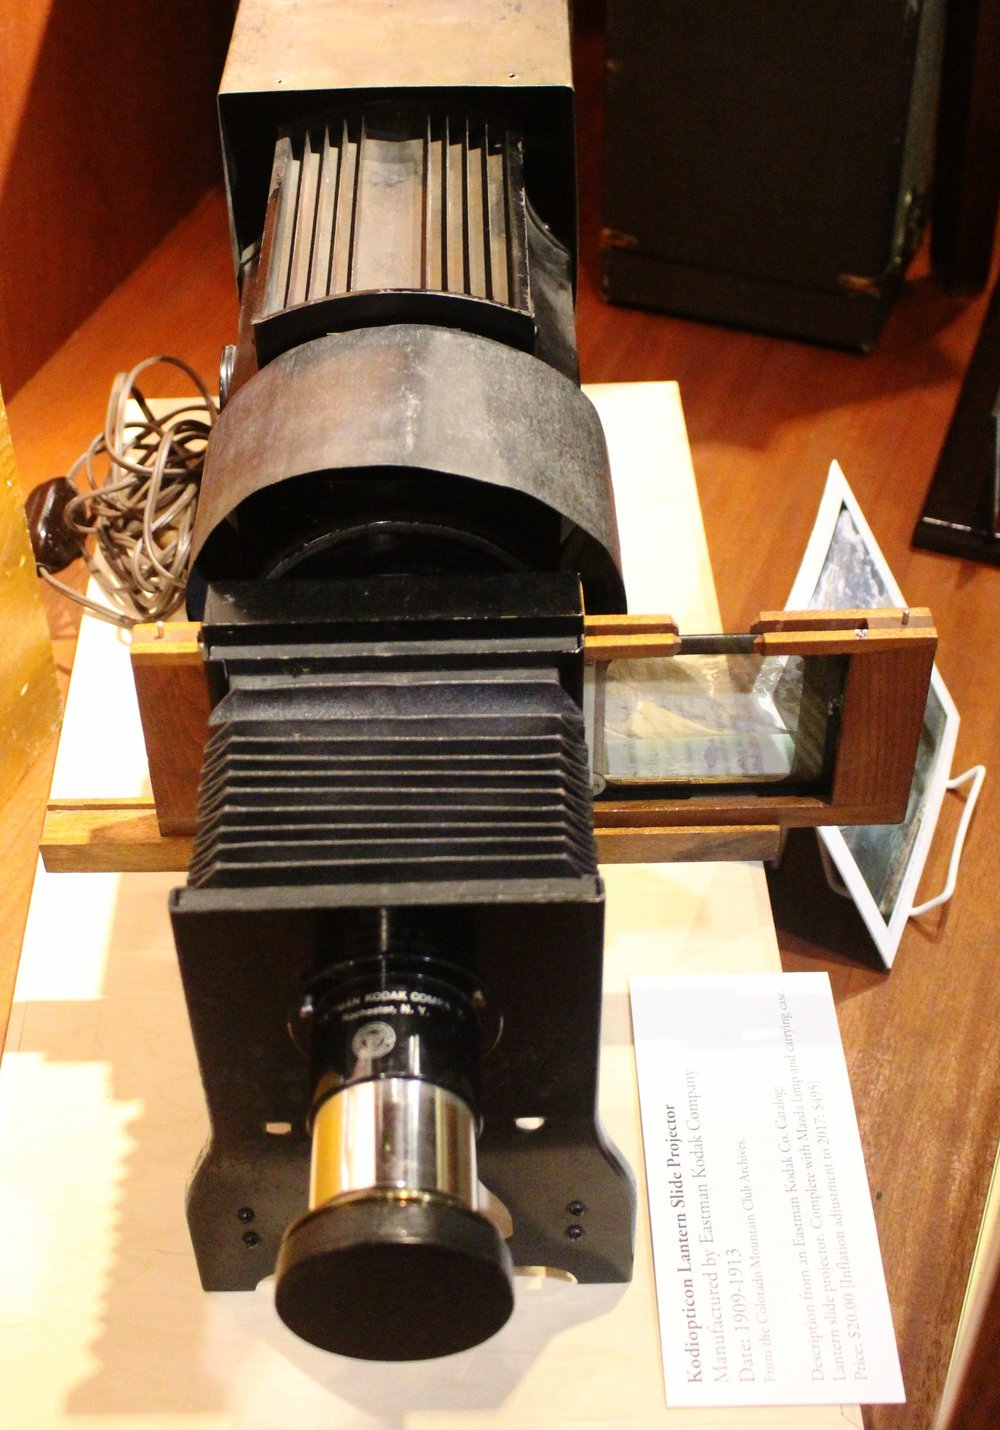 Kodiopticon Lantern Slide Projector